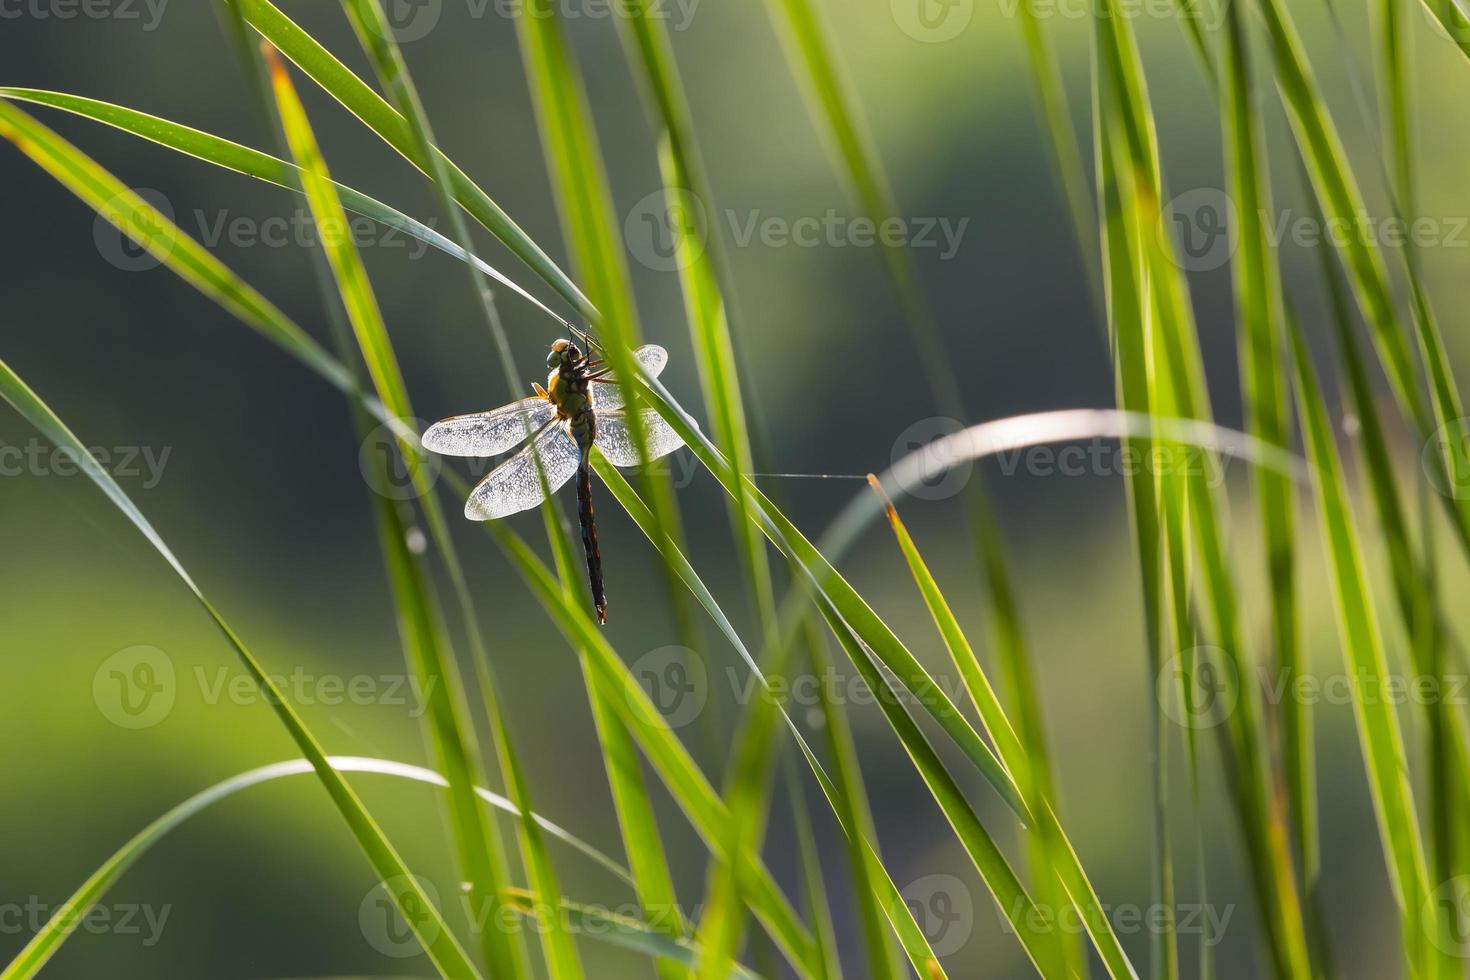 libélula retroiluminada en cañas verdes. foto